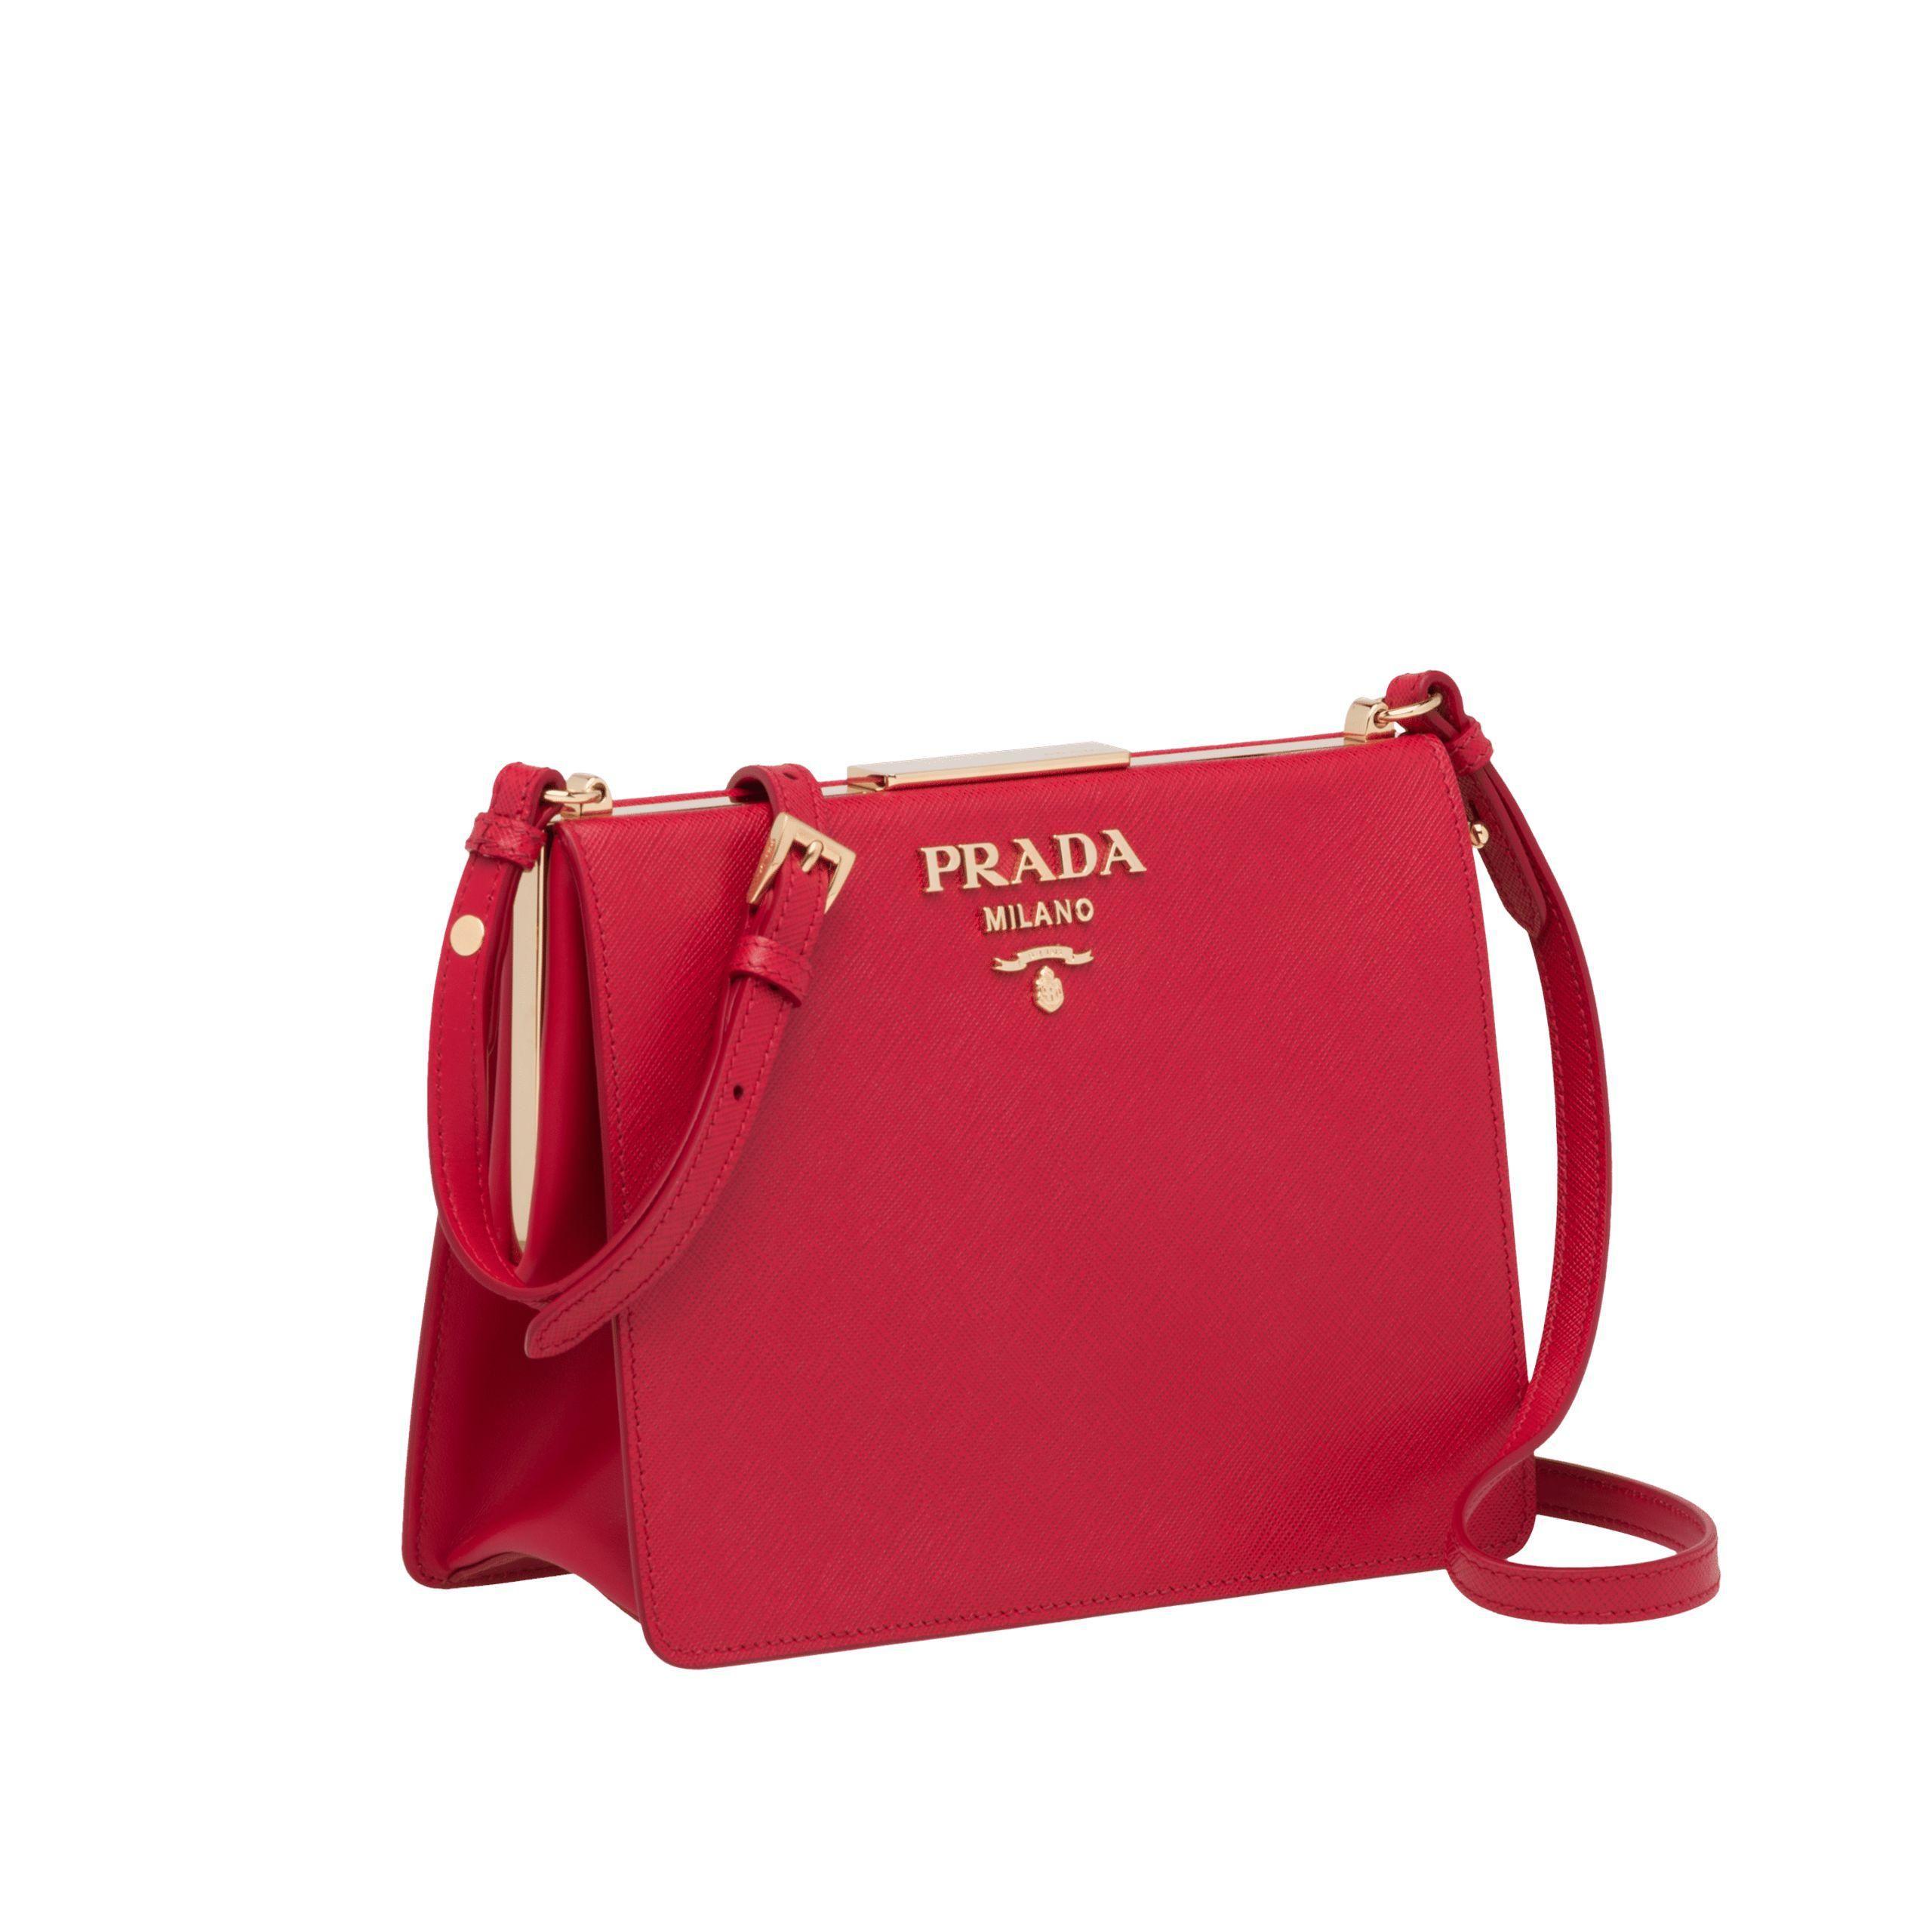 c47865f130ff Lyst - Prada Light Frame Saffiano Leather Bag in Red